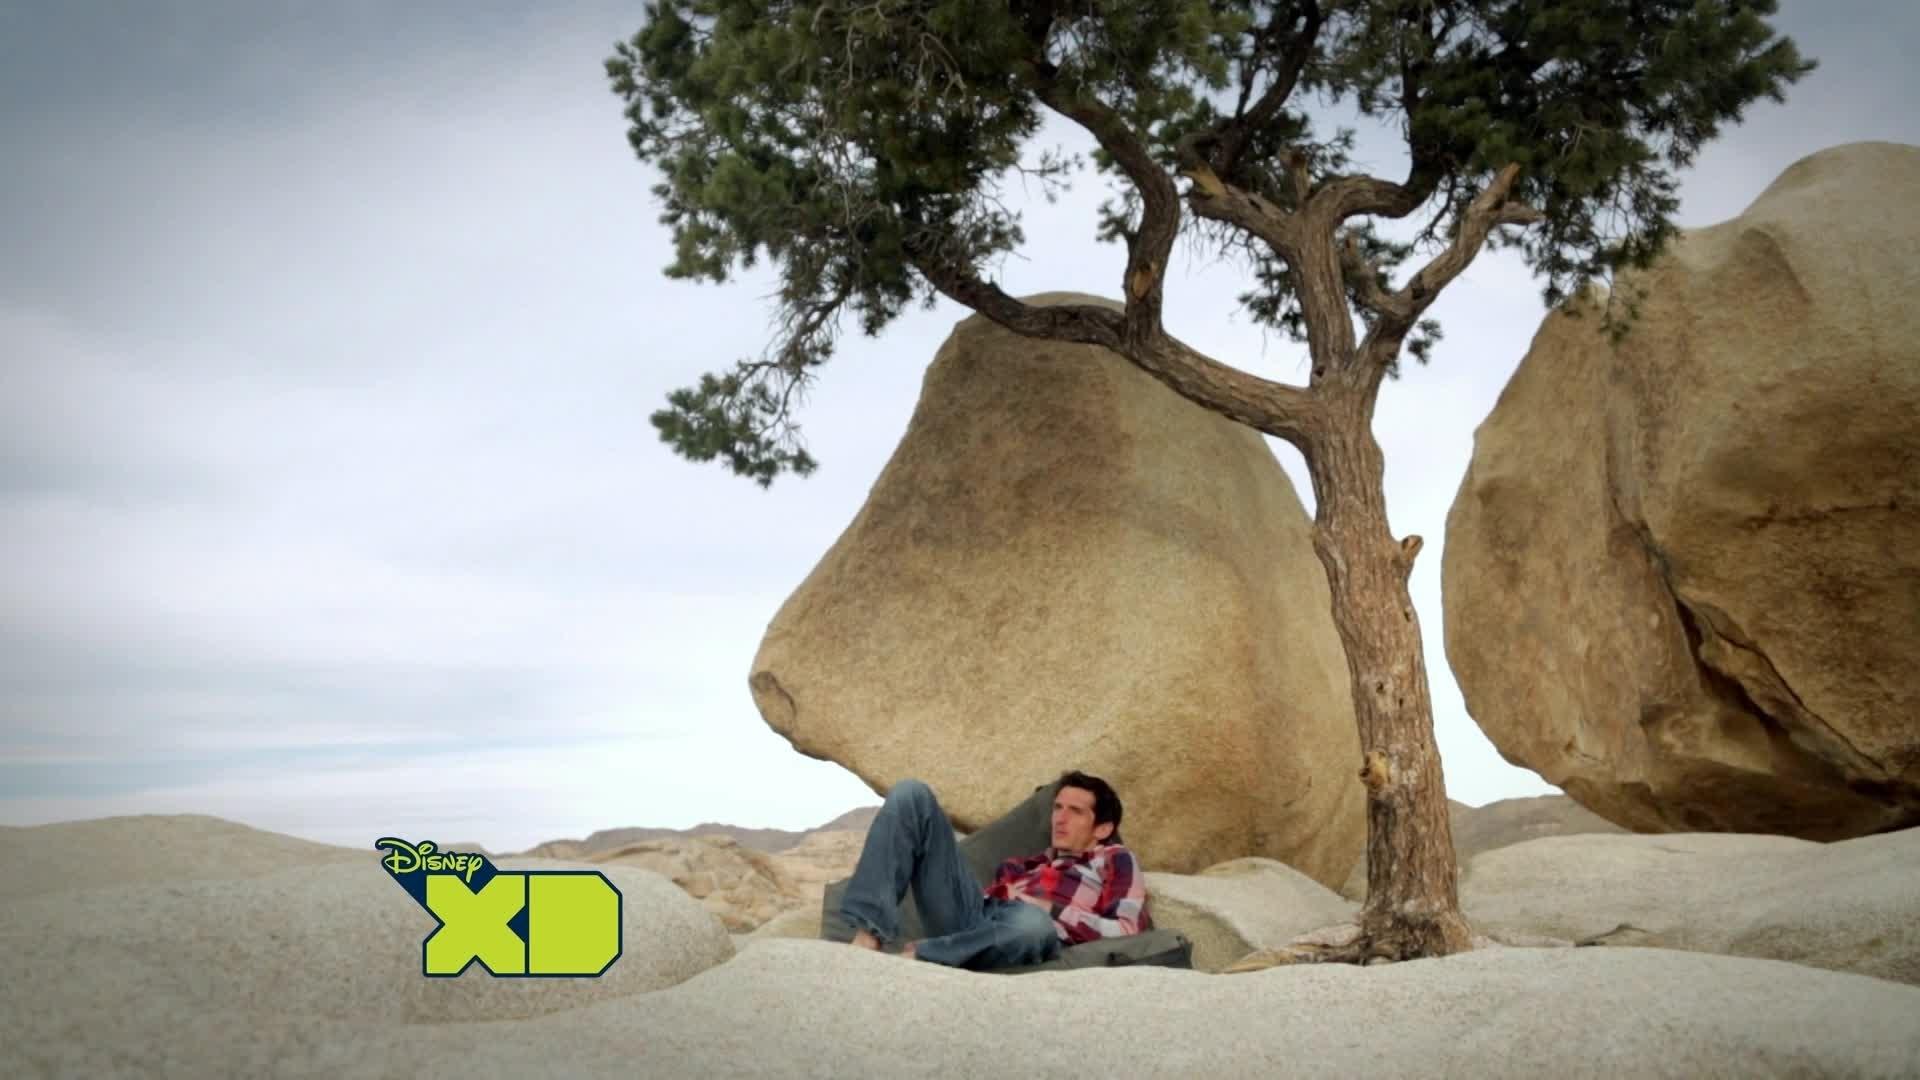 Disney XD Sport News - Romain Desgranges champion du monde d'escalade